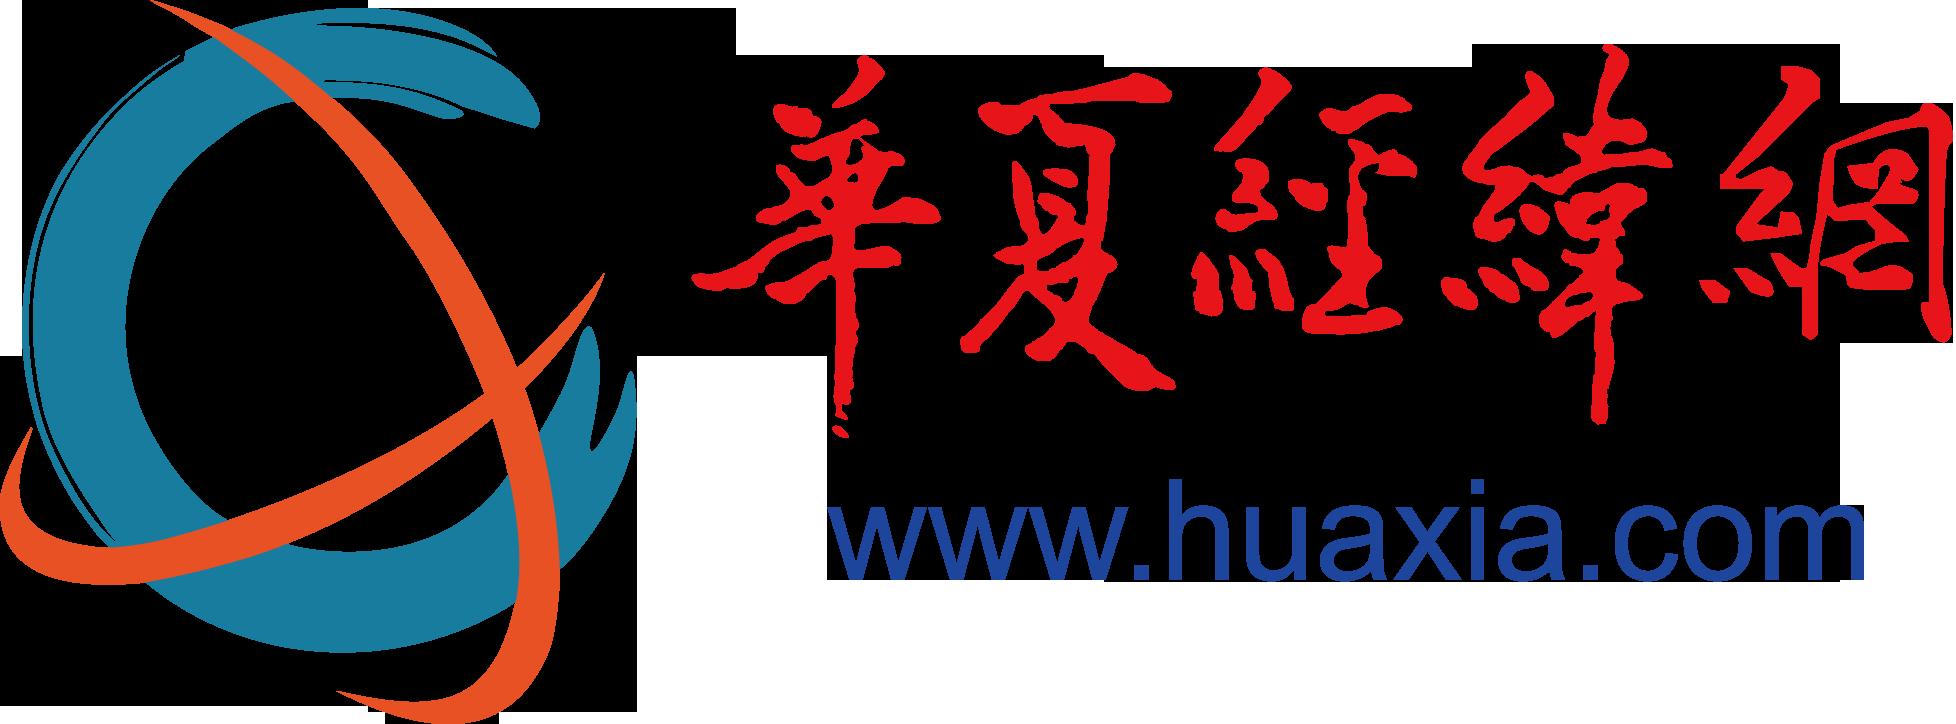 華夏經緯網logo.png